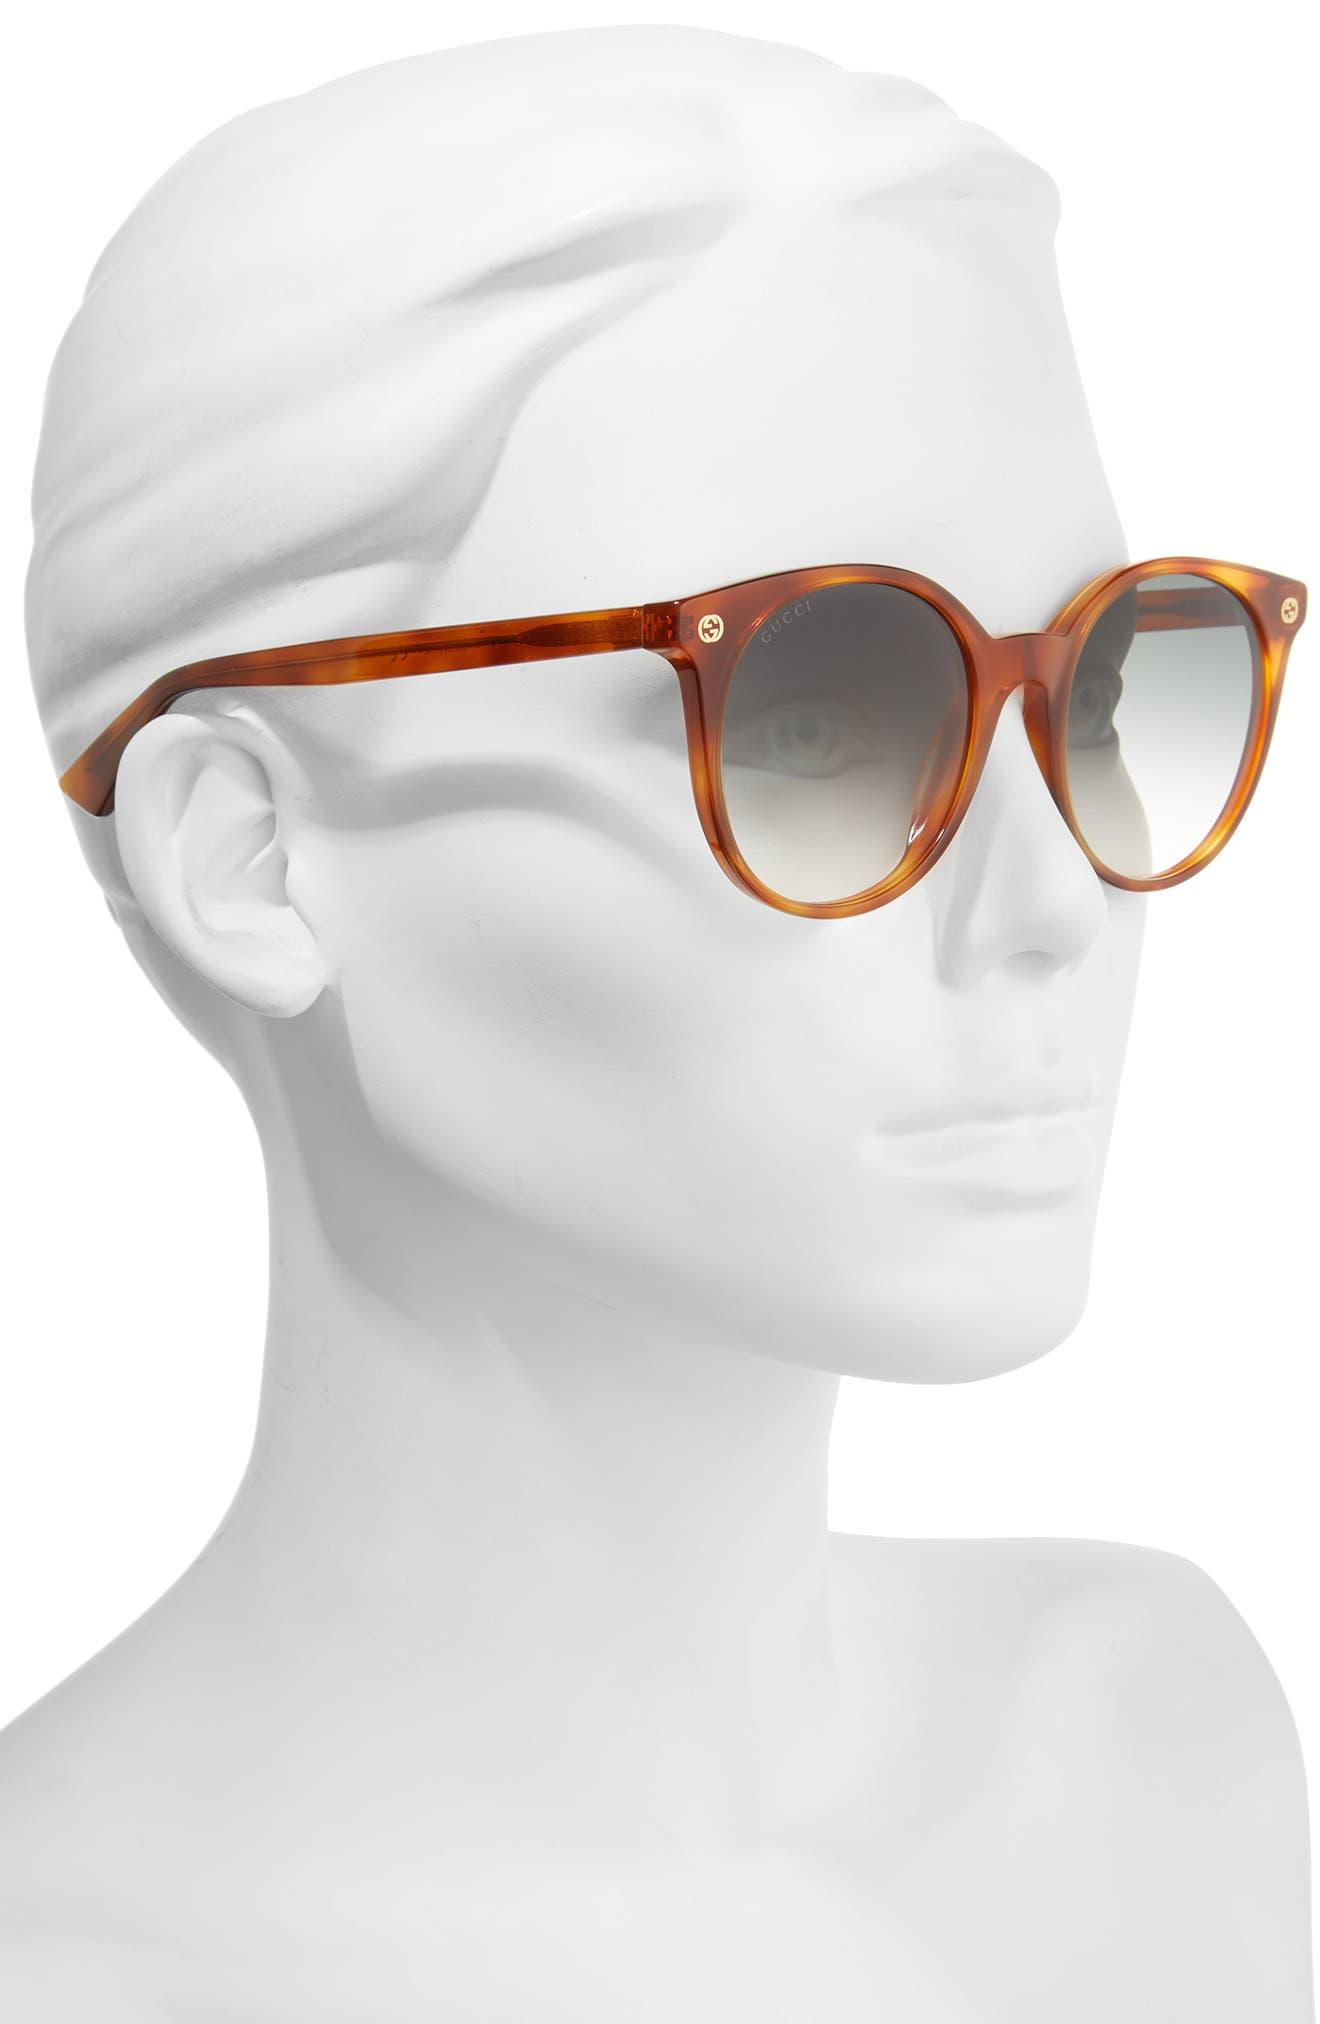 52mm Round Sunglasses,                             Alternate thumbnail 7, color,